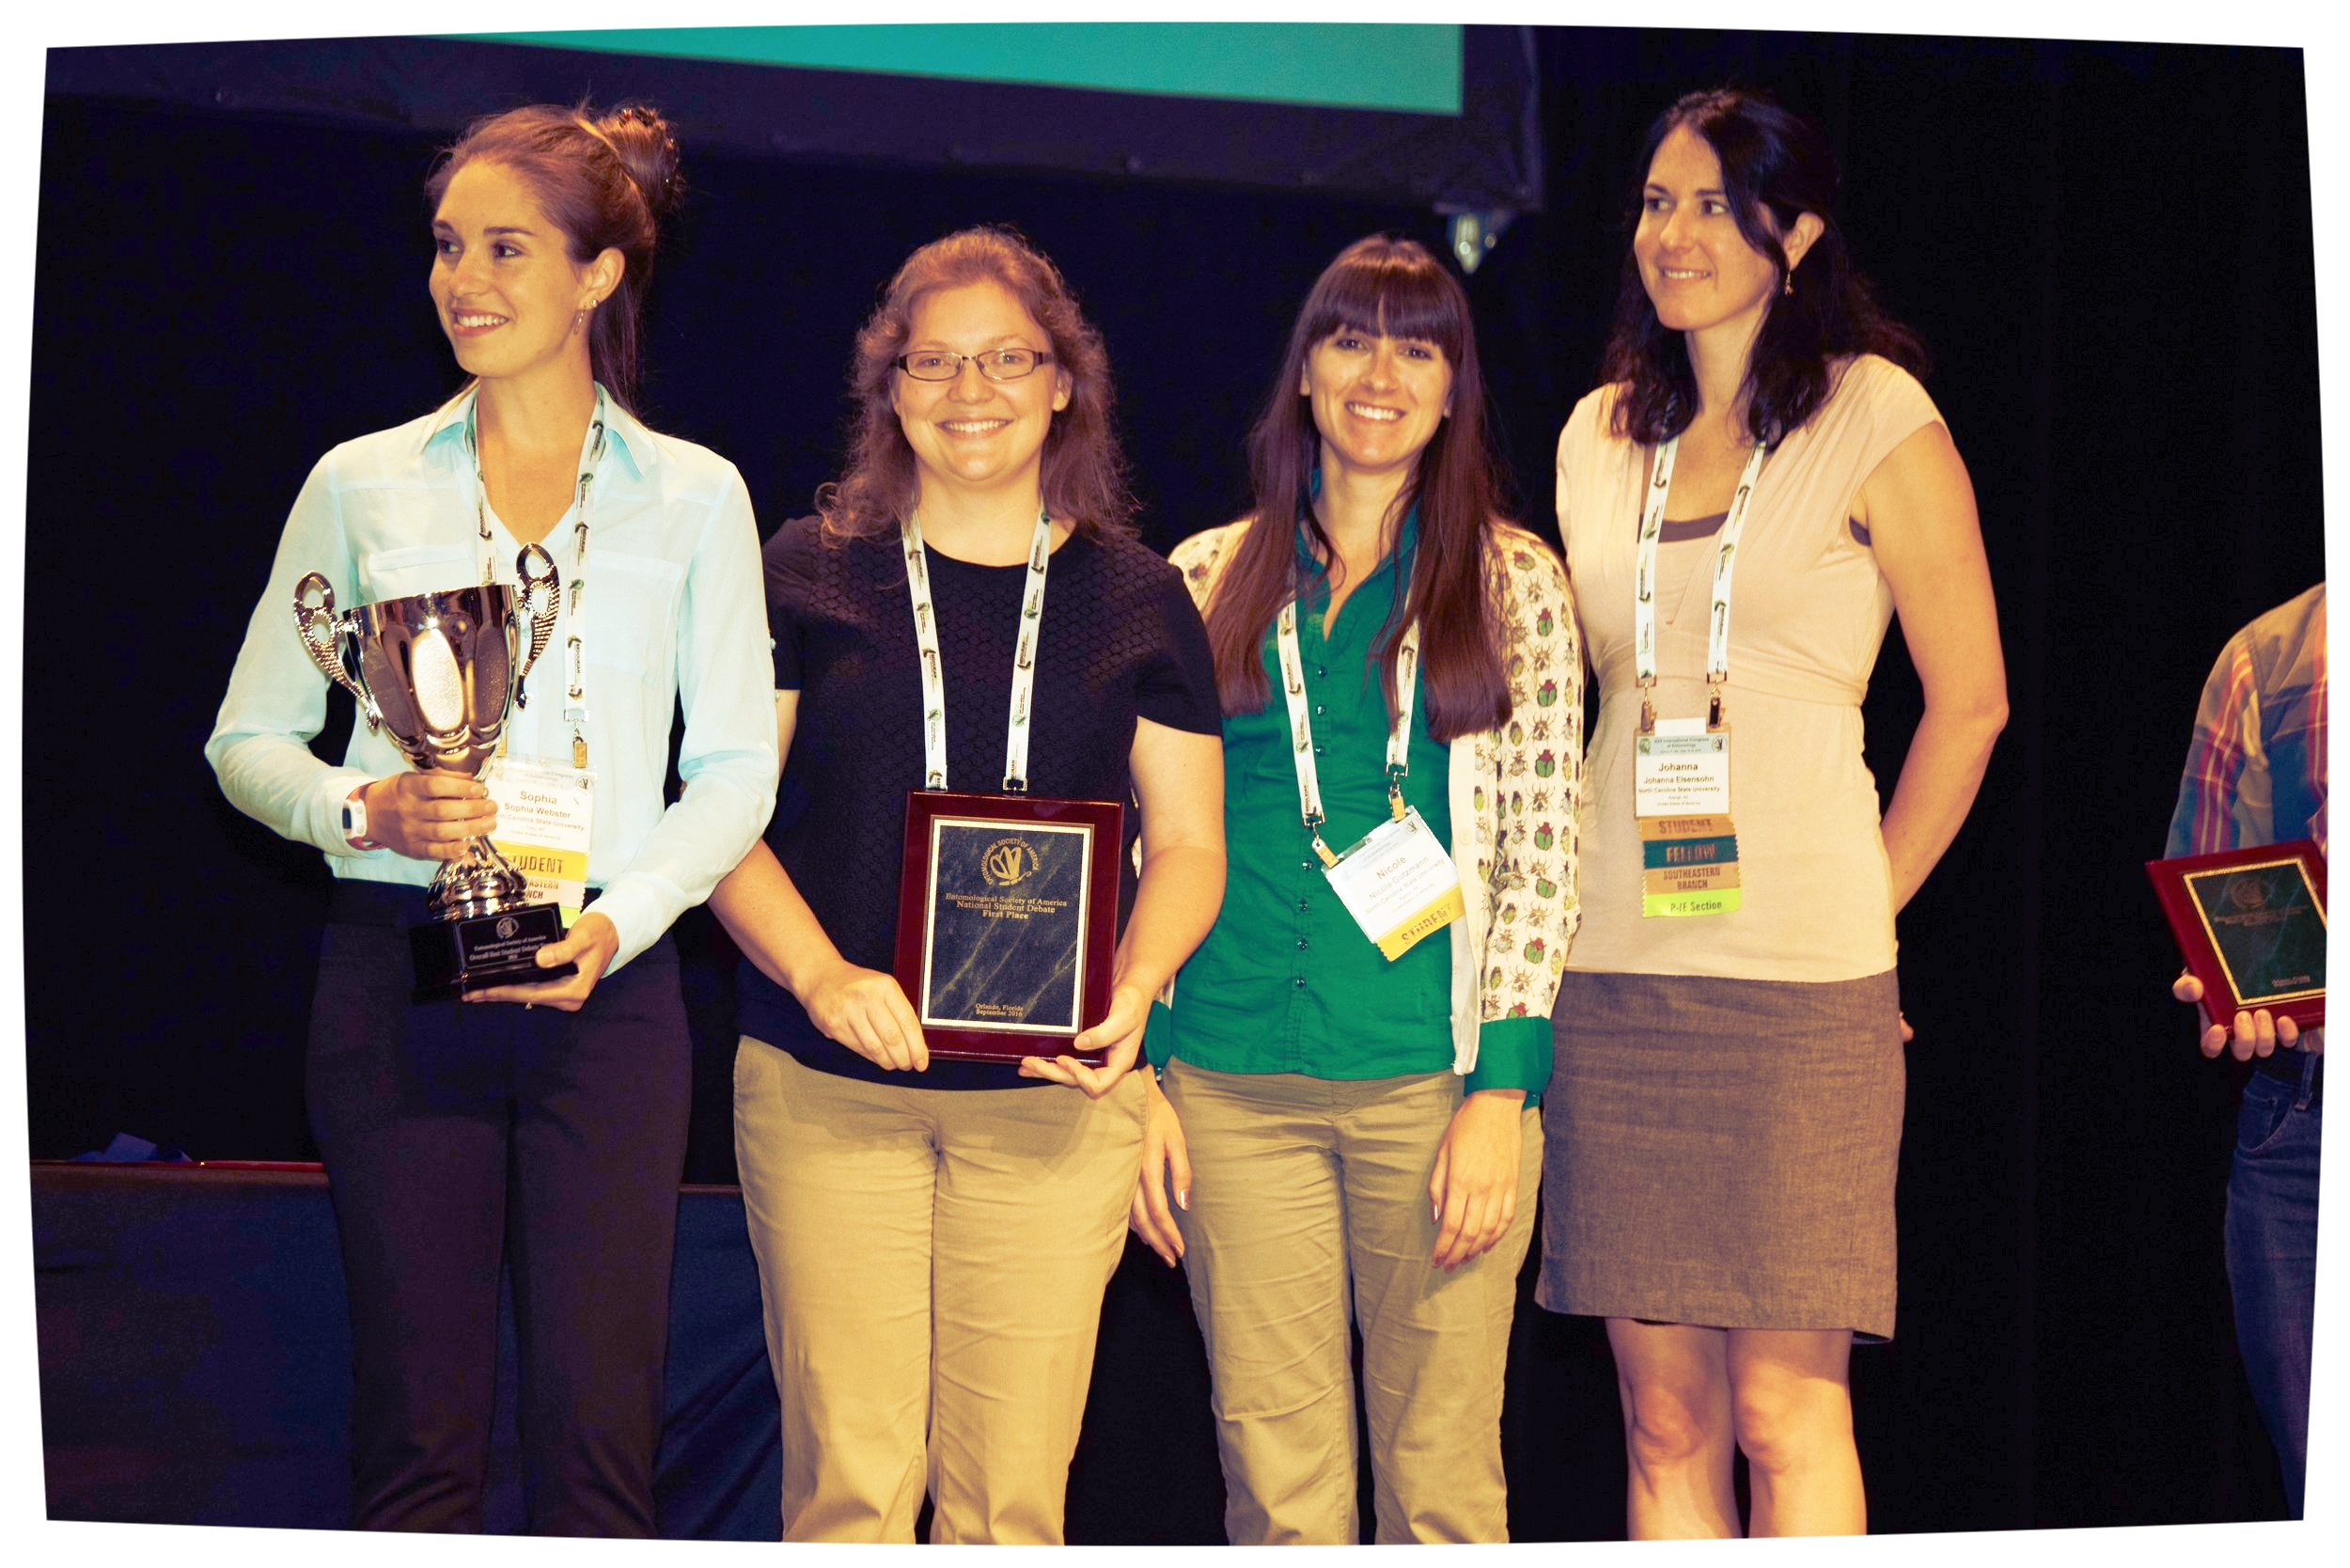 Pictured (L-R): Sophia Webster, Jennifer Baltzegar, Nicole Gutzmann, Johanna Elsensohn